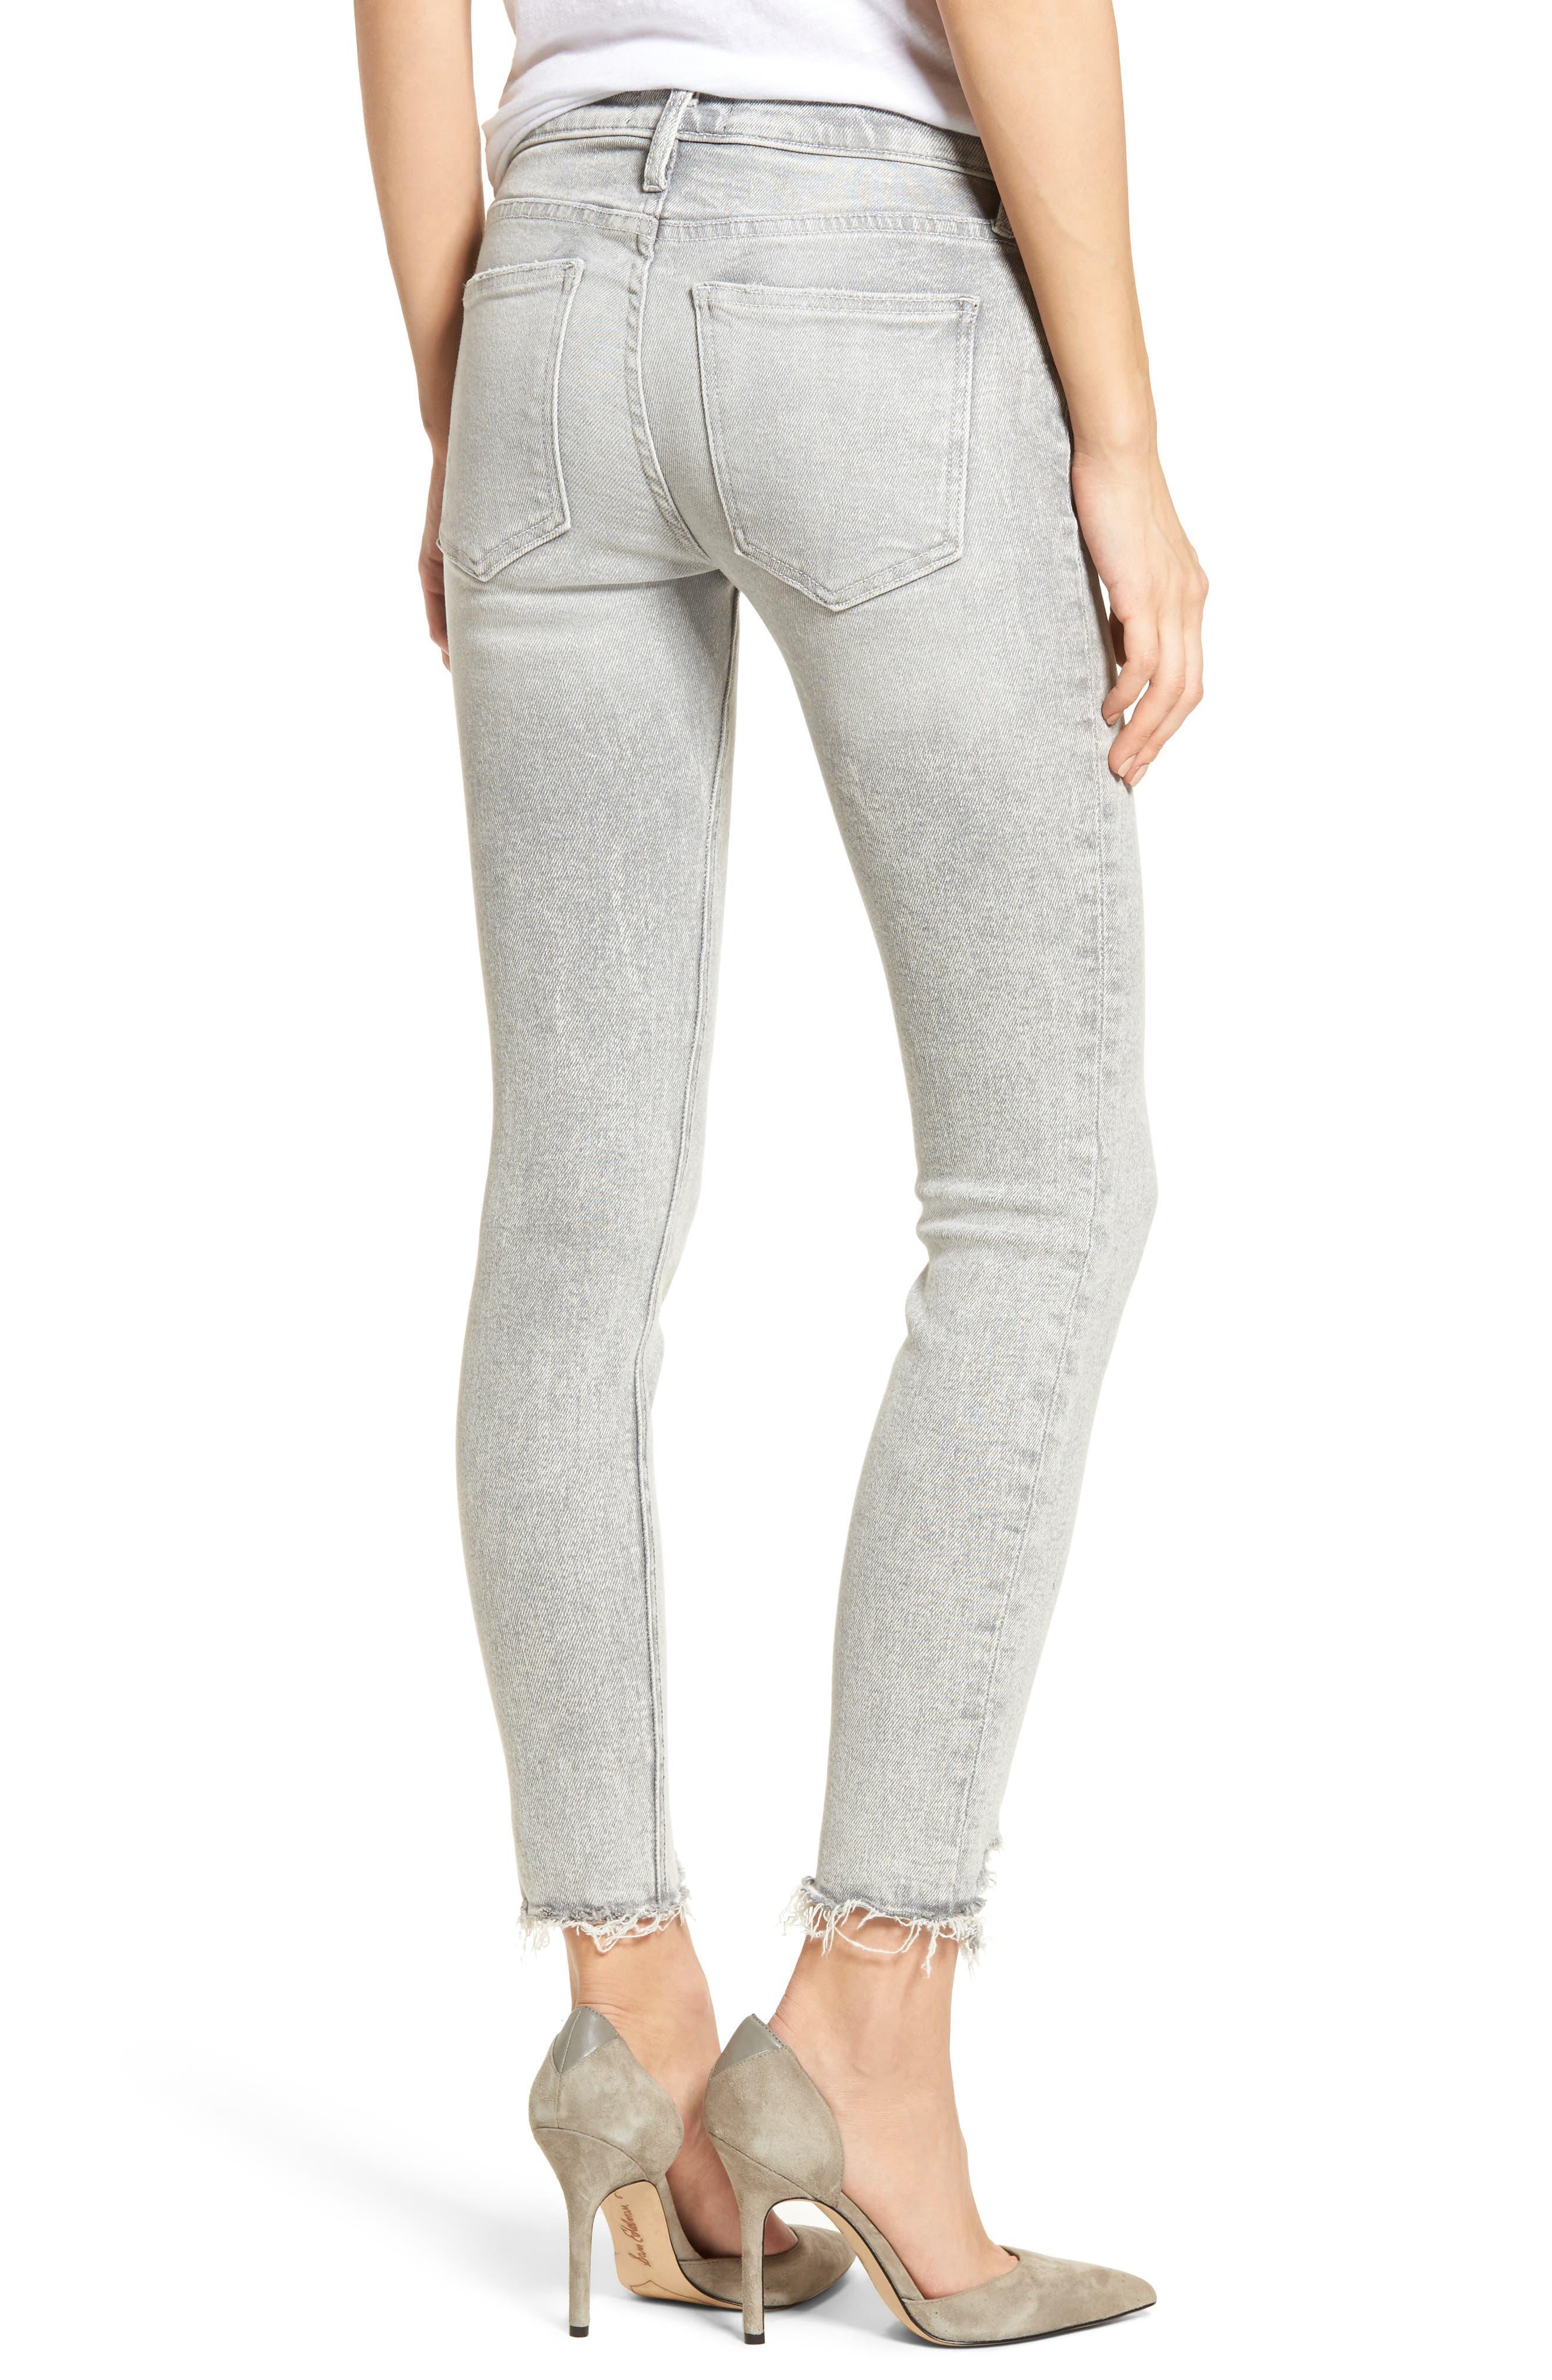 Alternate Image 3  - Current/Elliott The Stiletto High Waist Ankle Skinny Jeans (Astor)